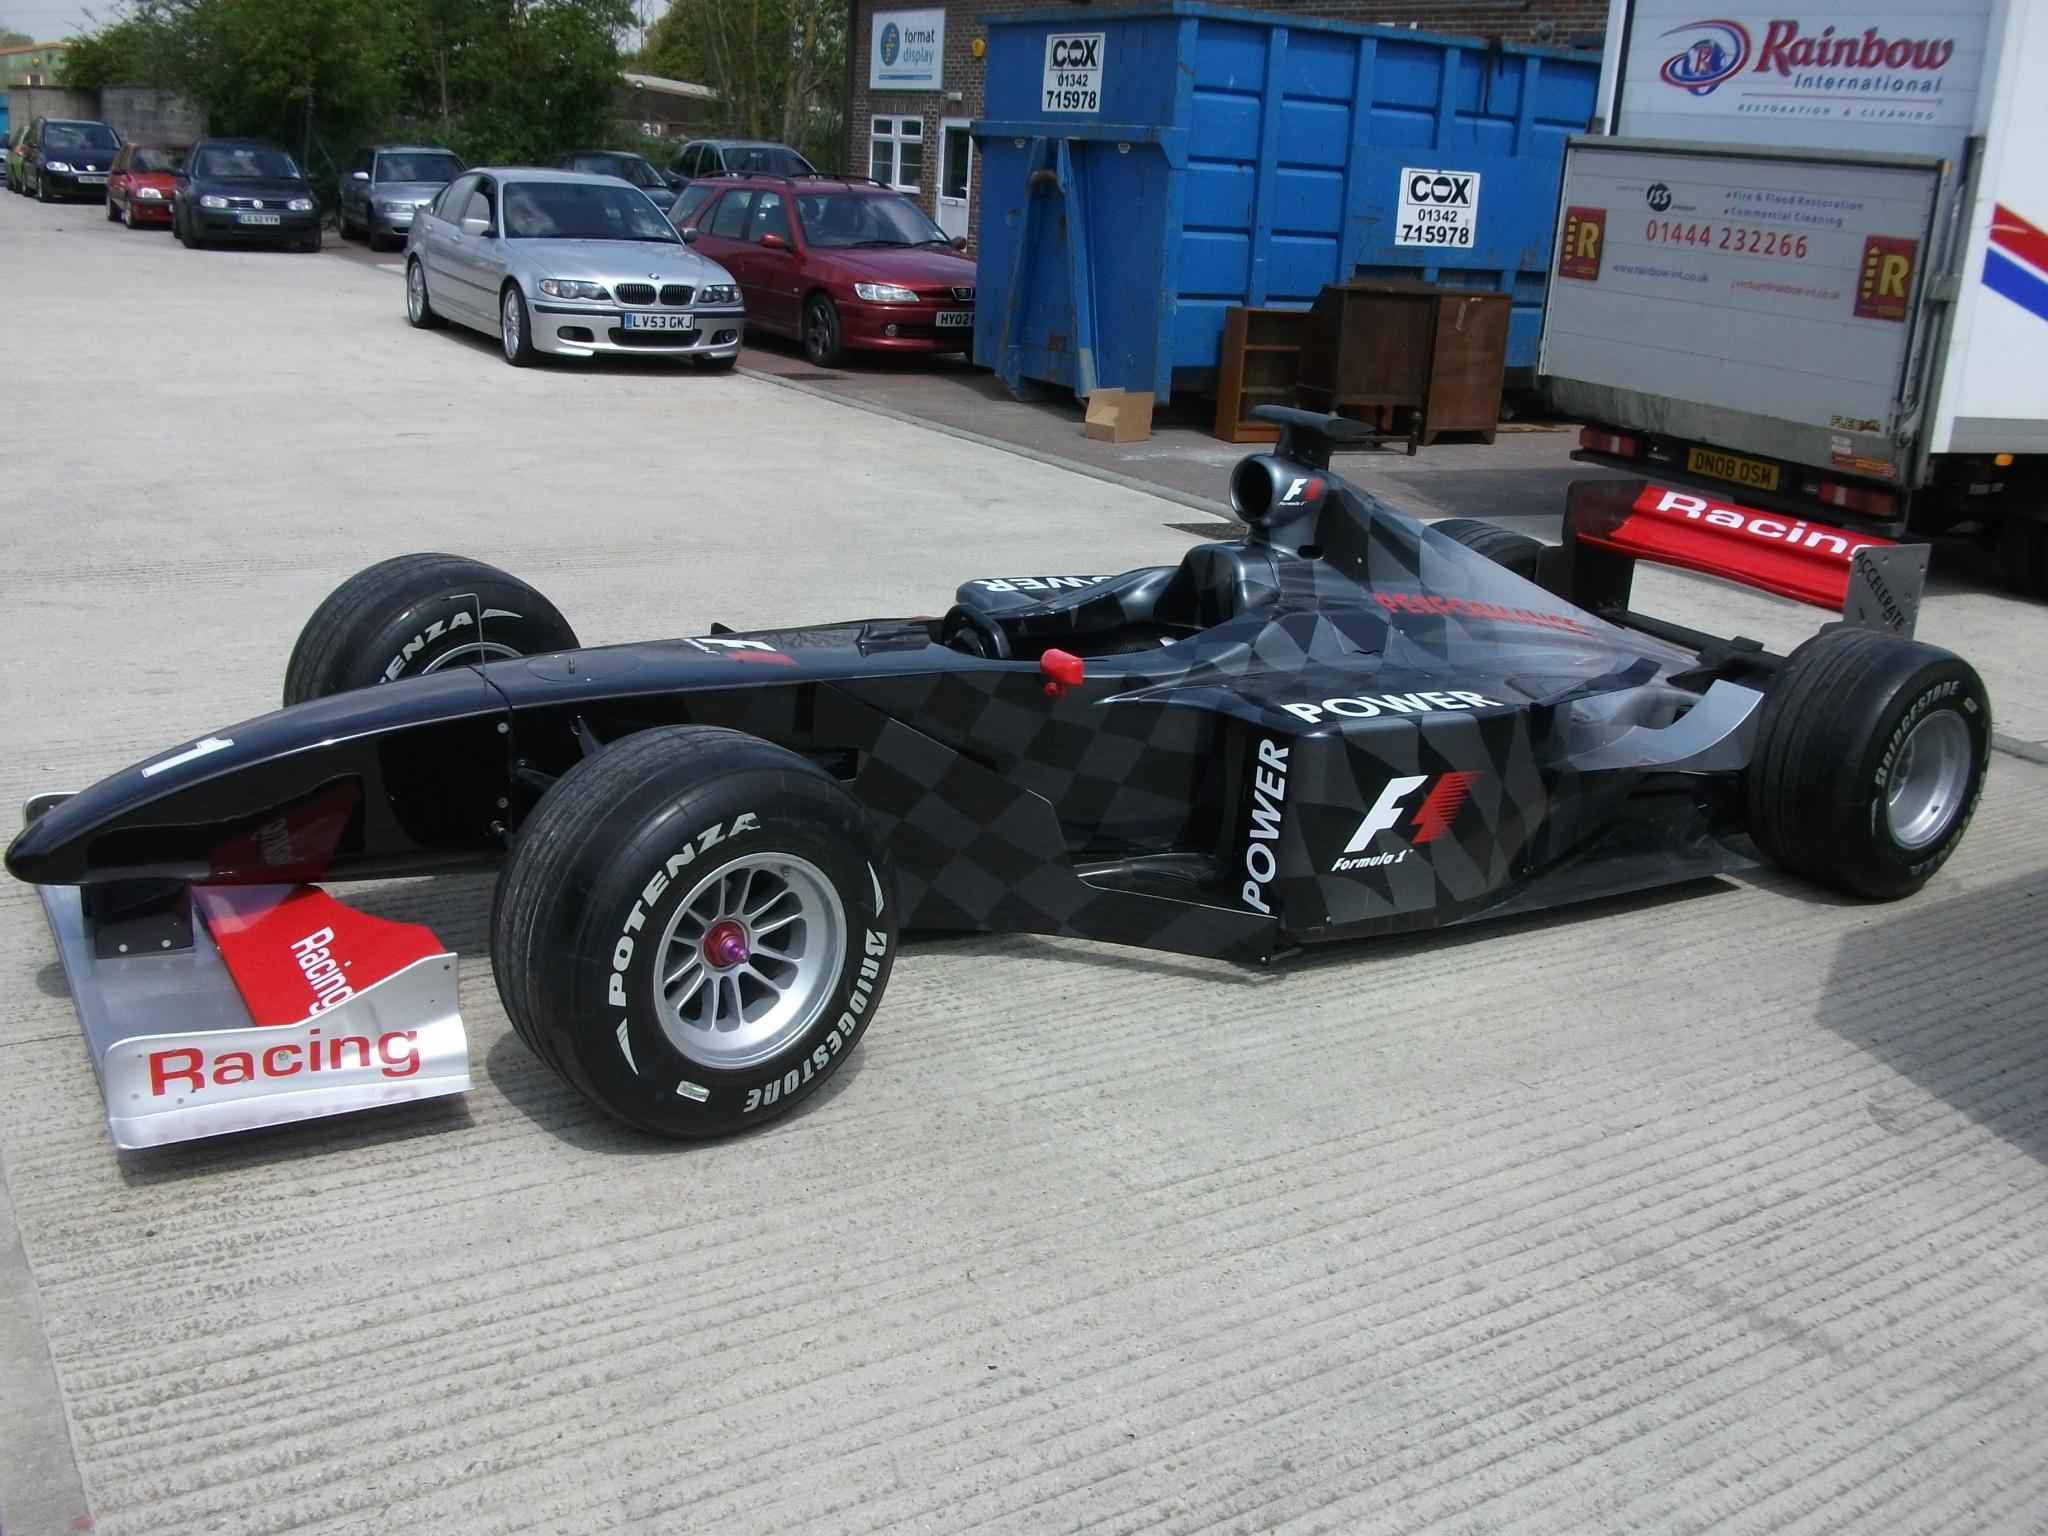 Amazing F1 Cars For Sale Embellishment - Classic Cars Ideas - boiq.info